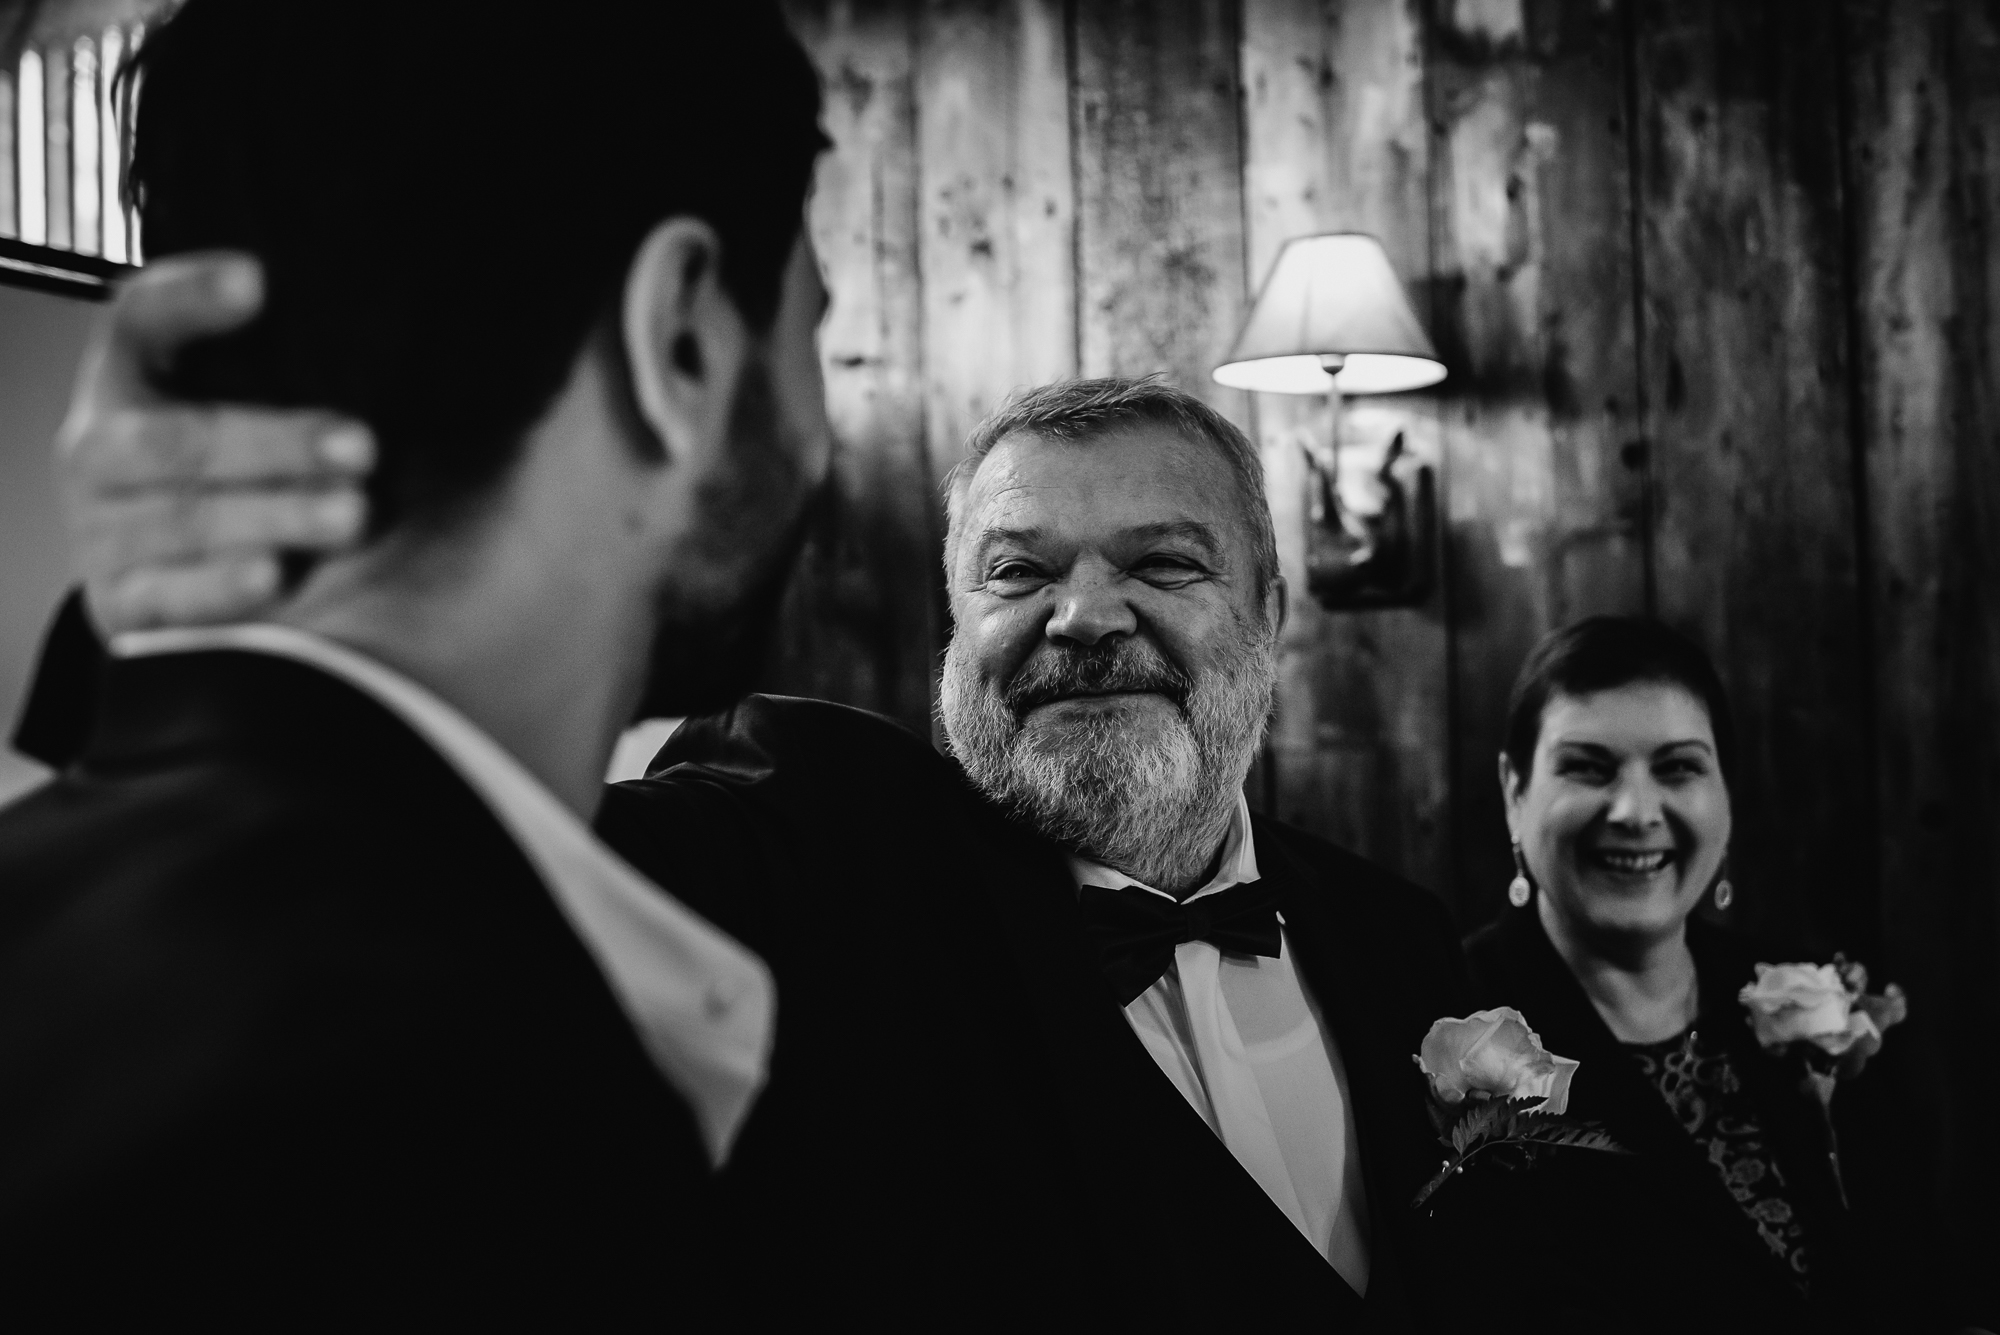 Owen HOuse Wedding Barn WEdding Photographer cheshire adam joe roberts photography (6 of 36).jpg